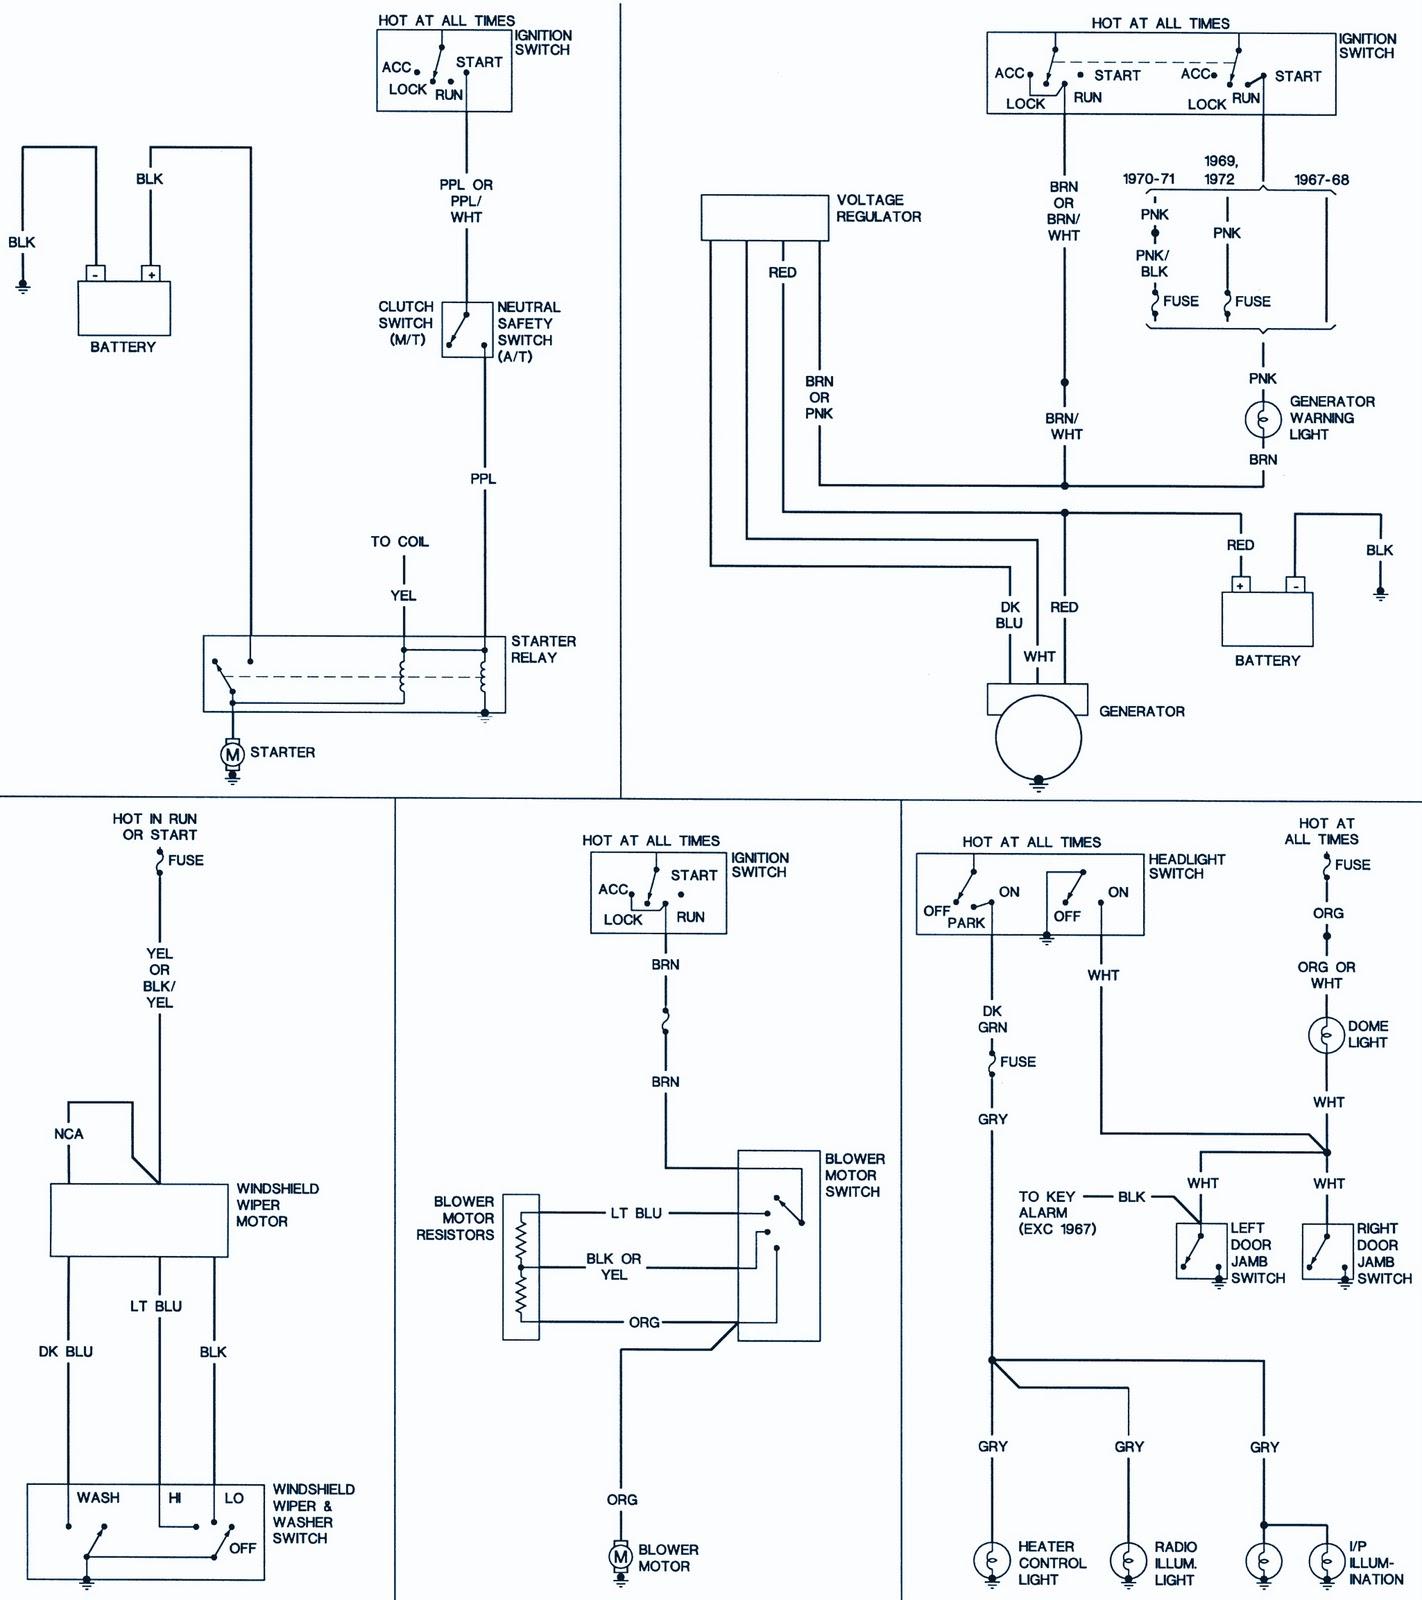 71 blazer wiring diagram technical diagrams 71 Blazer Emblems